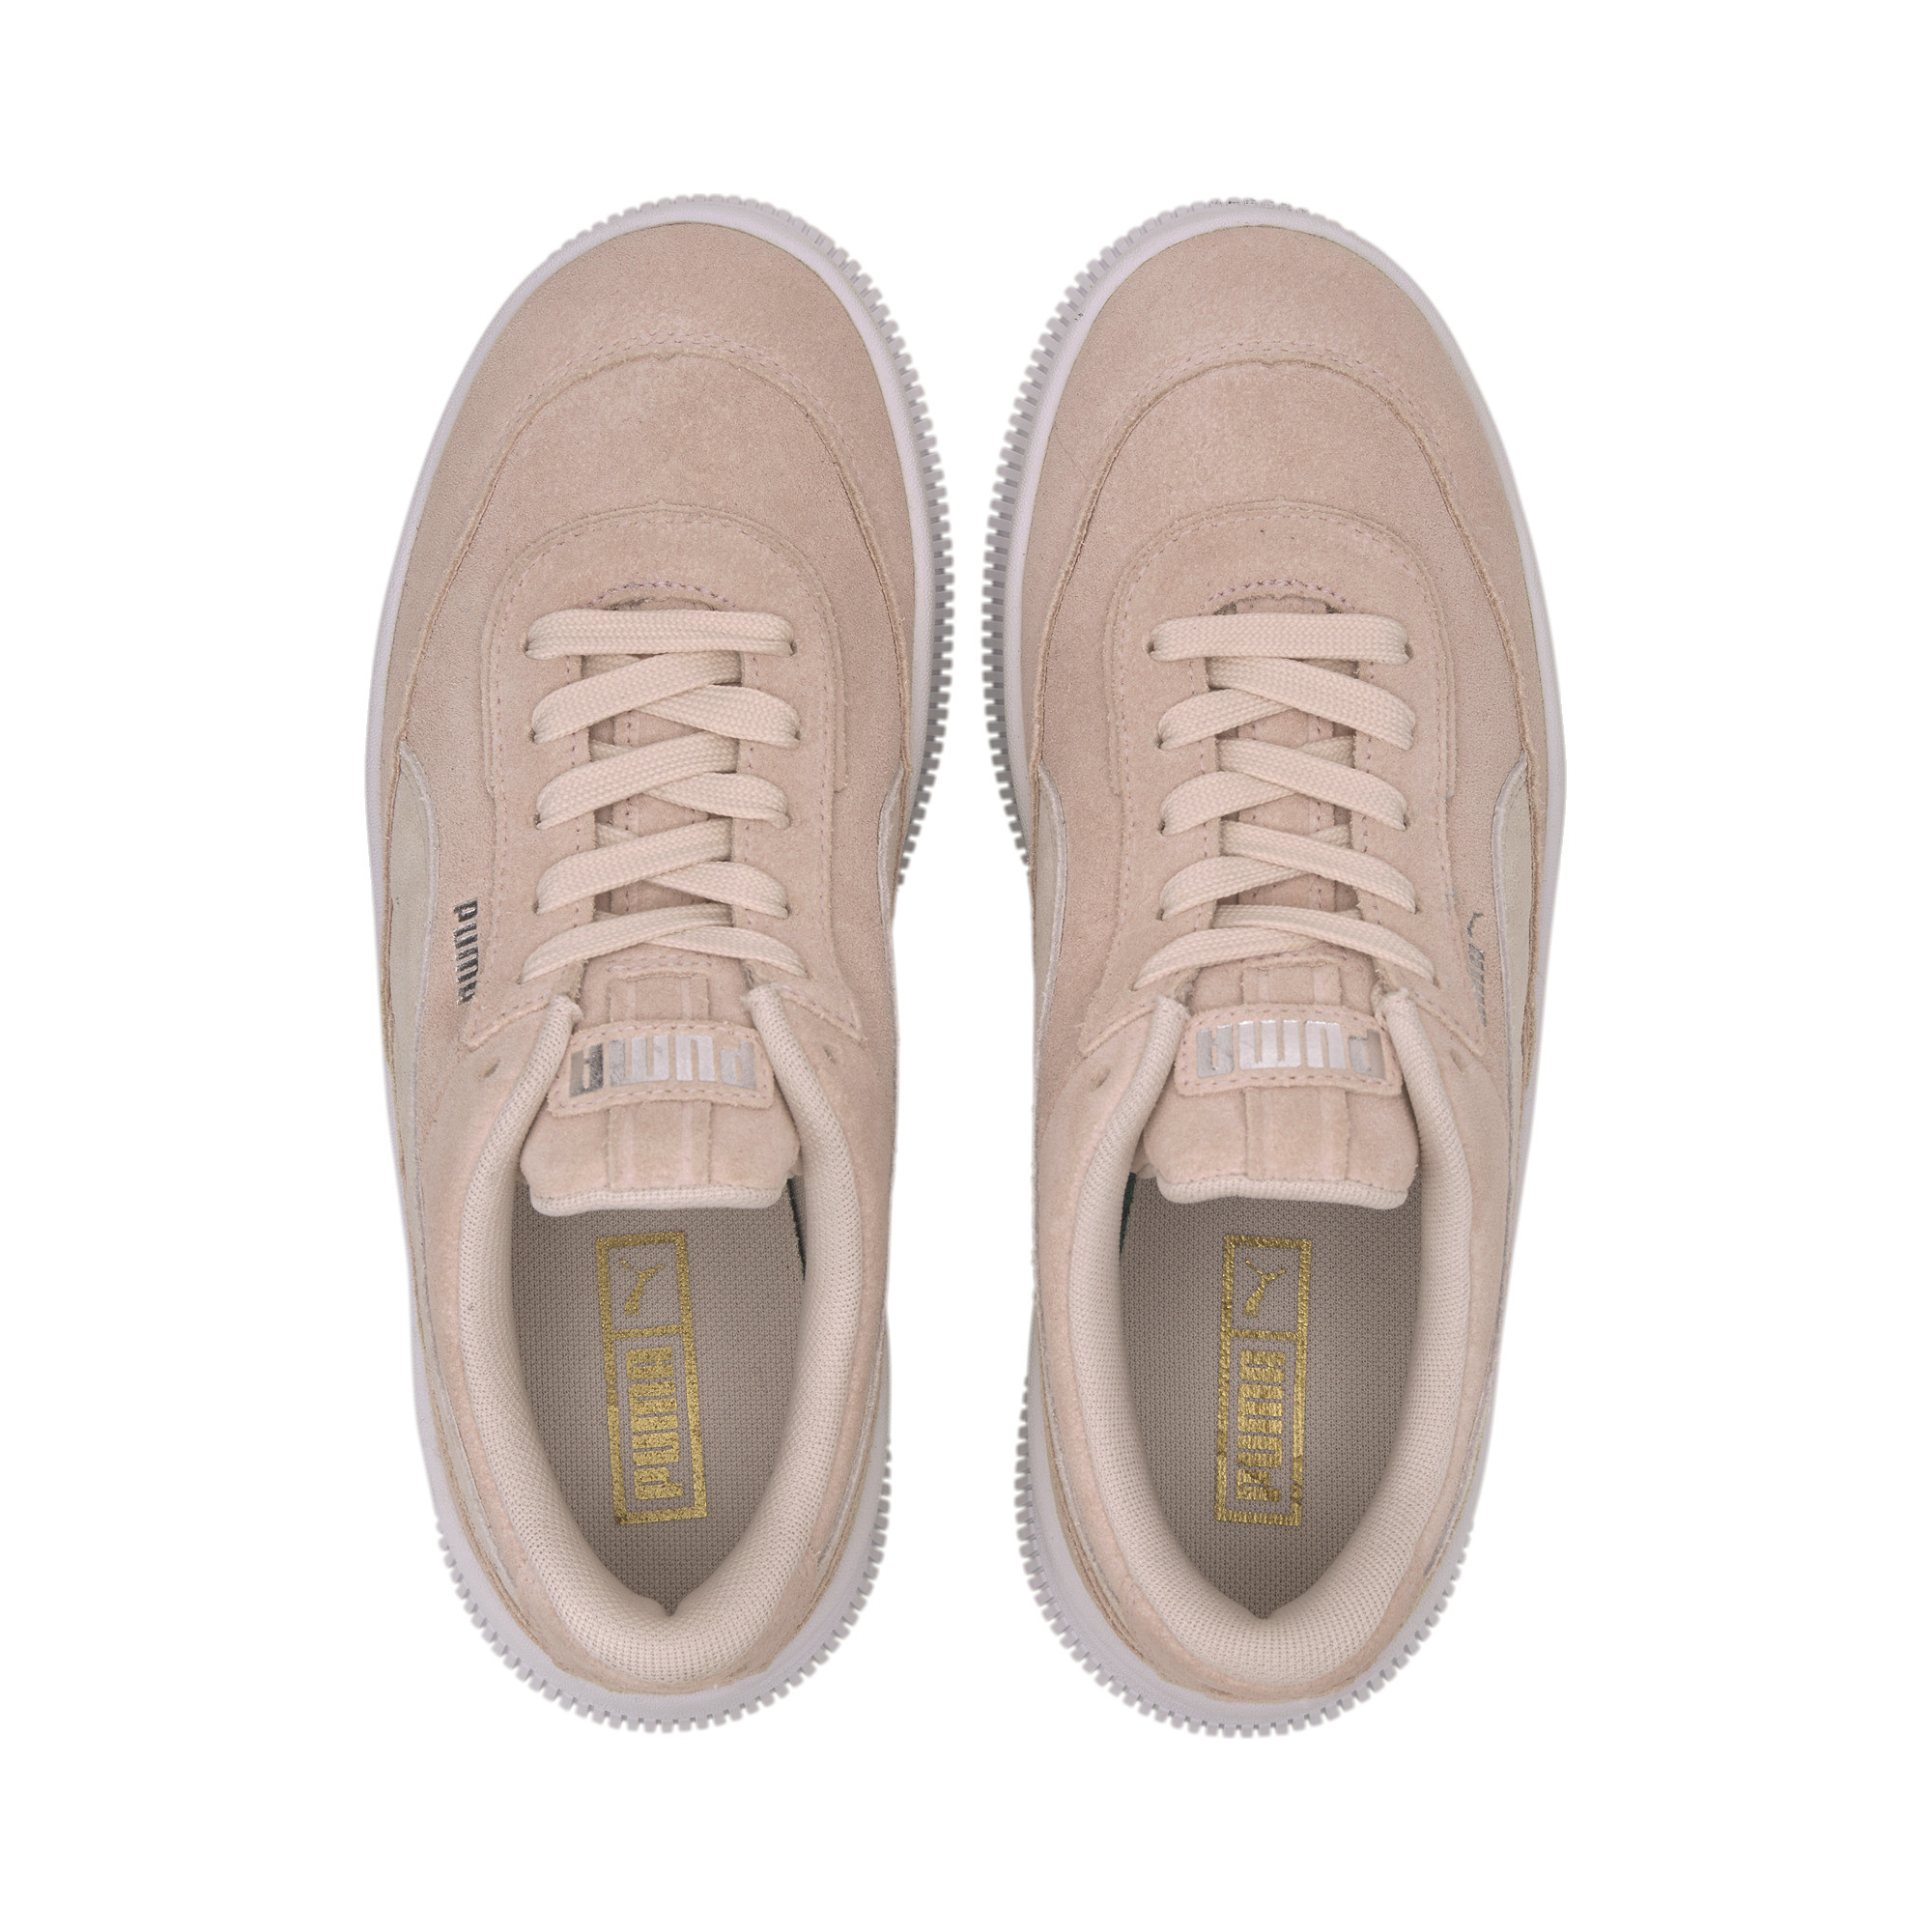 PUMA-Women-039-s-DEVA-Suede-Sneakers thumbnail 15